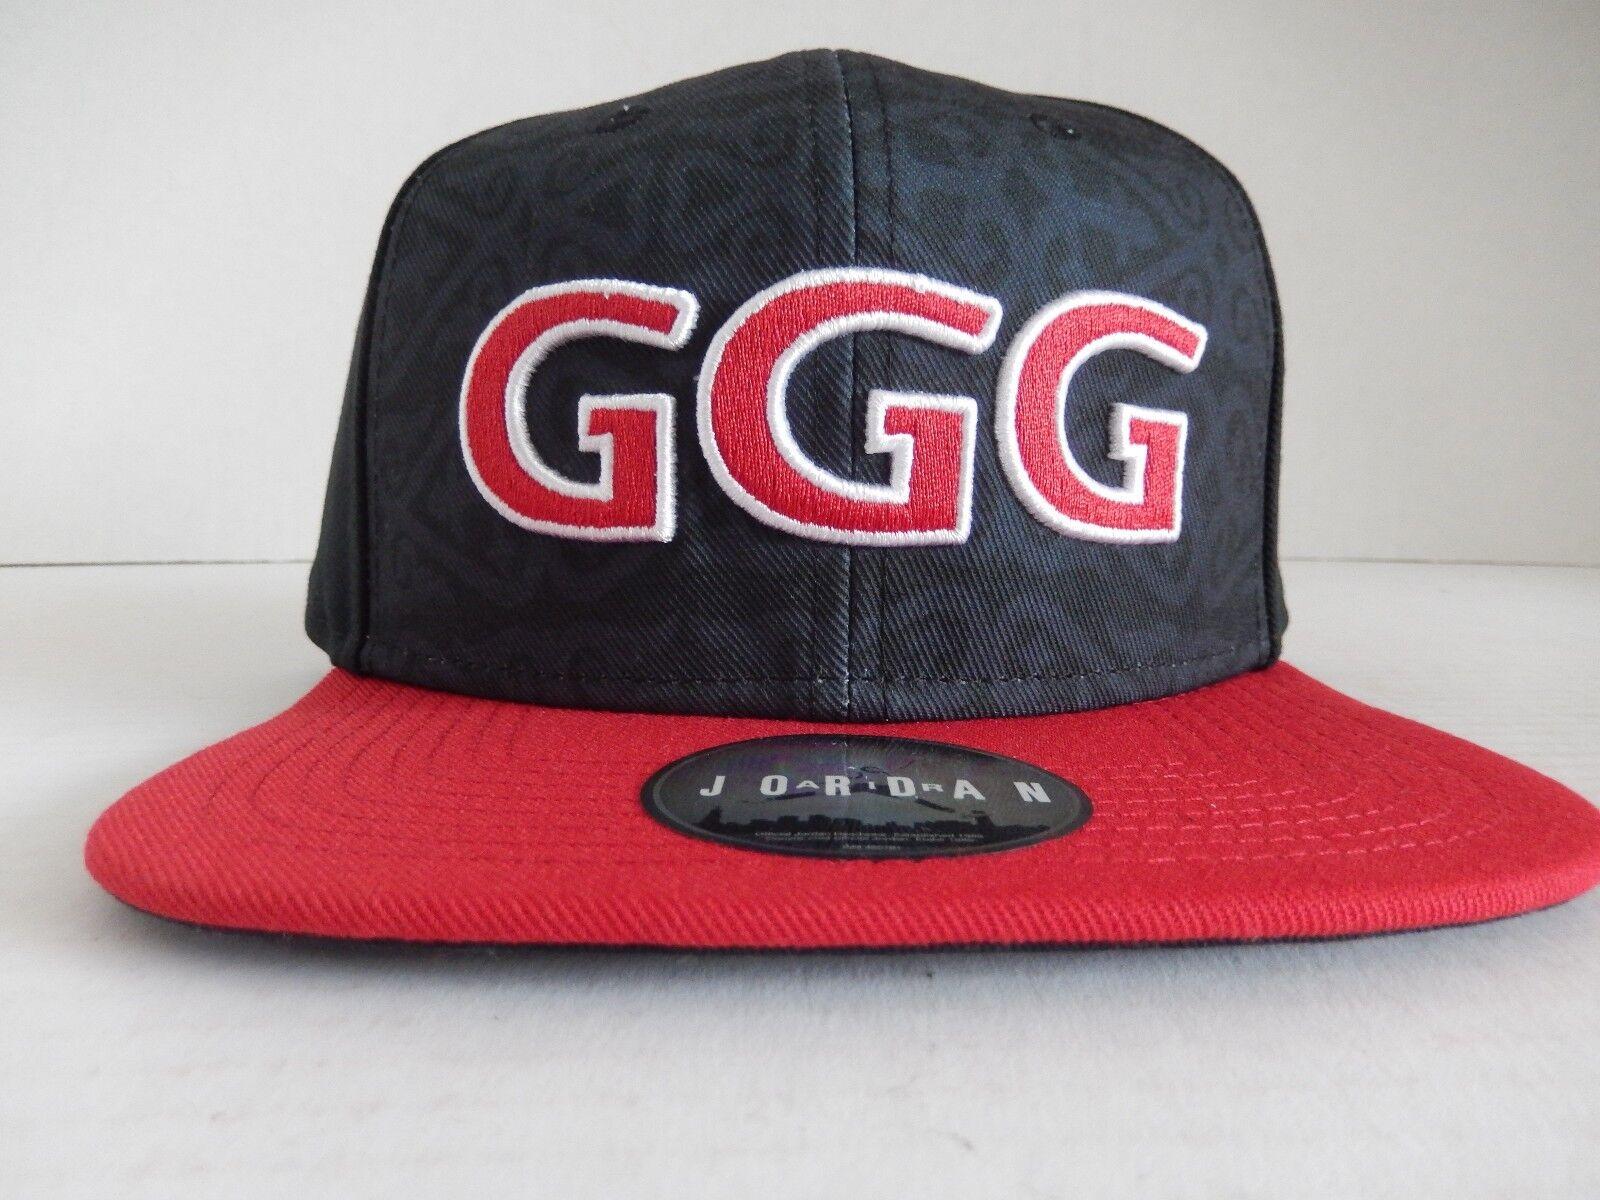 Por adelantado Darse prisa disco  NIKE GENNADY GGG GOLOVKIN JORDAN BRAND HAT BLACK-RED RARE! [AQ9329-011] for  sale online